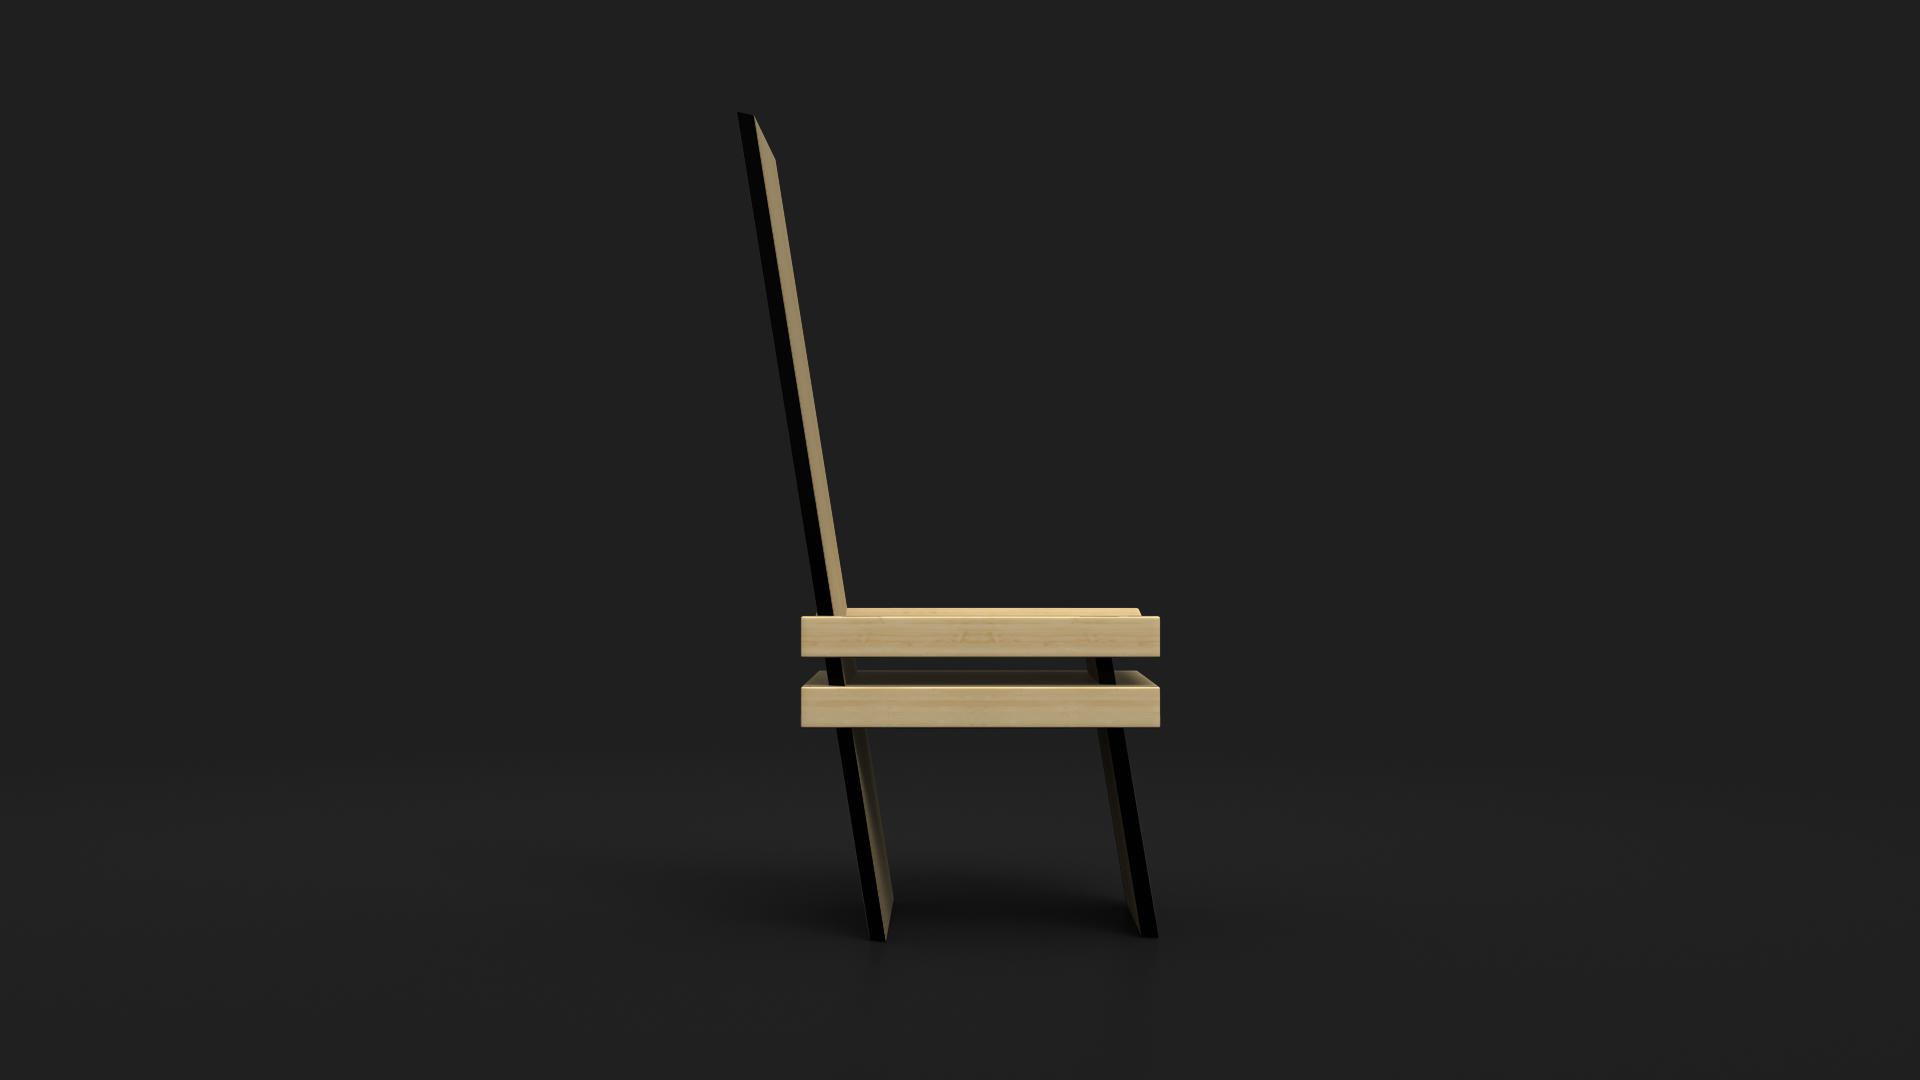 arclight-bamboo-side.jpg